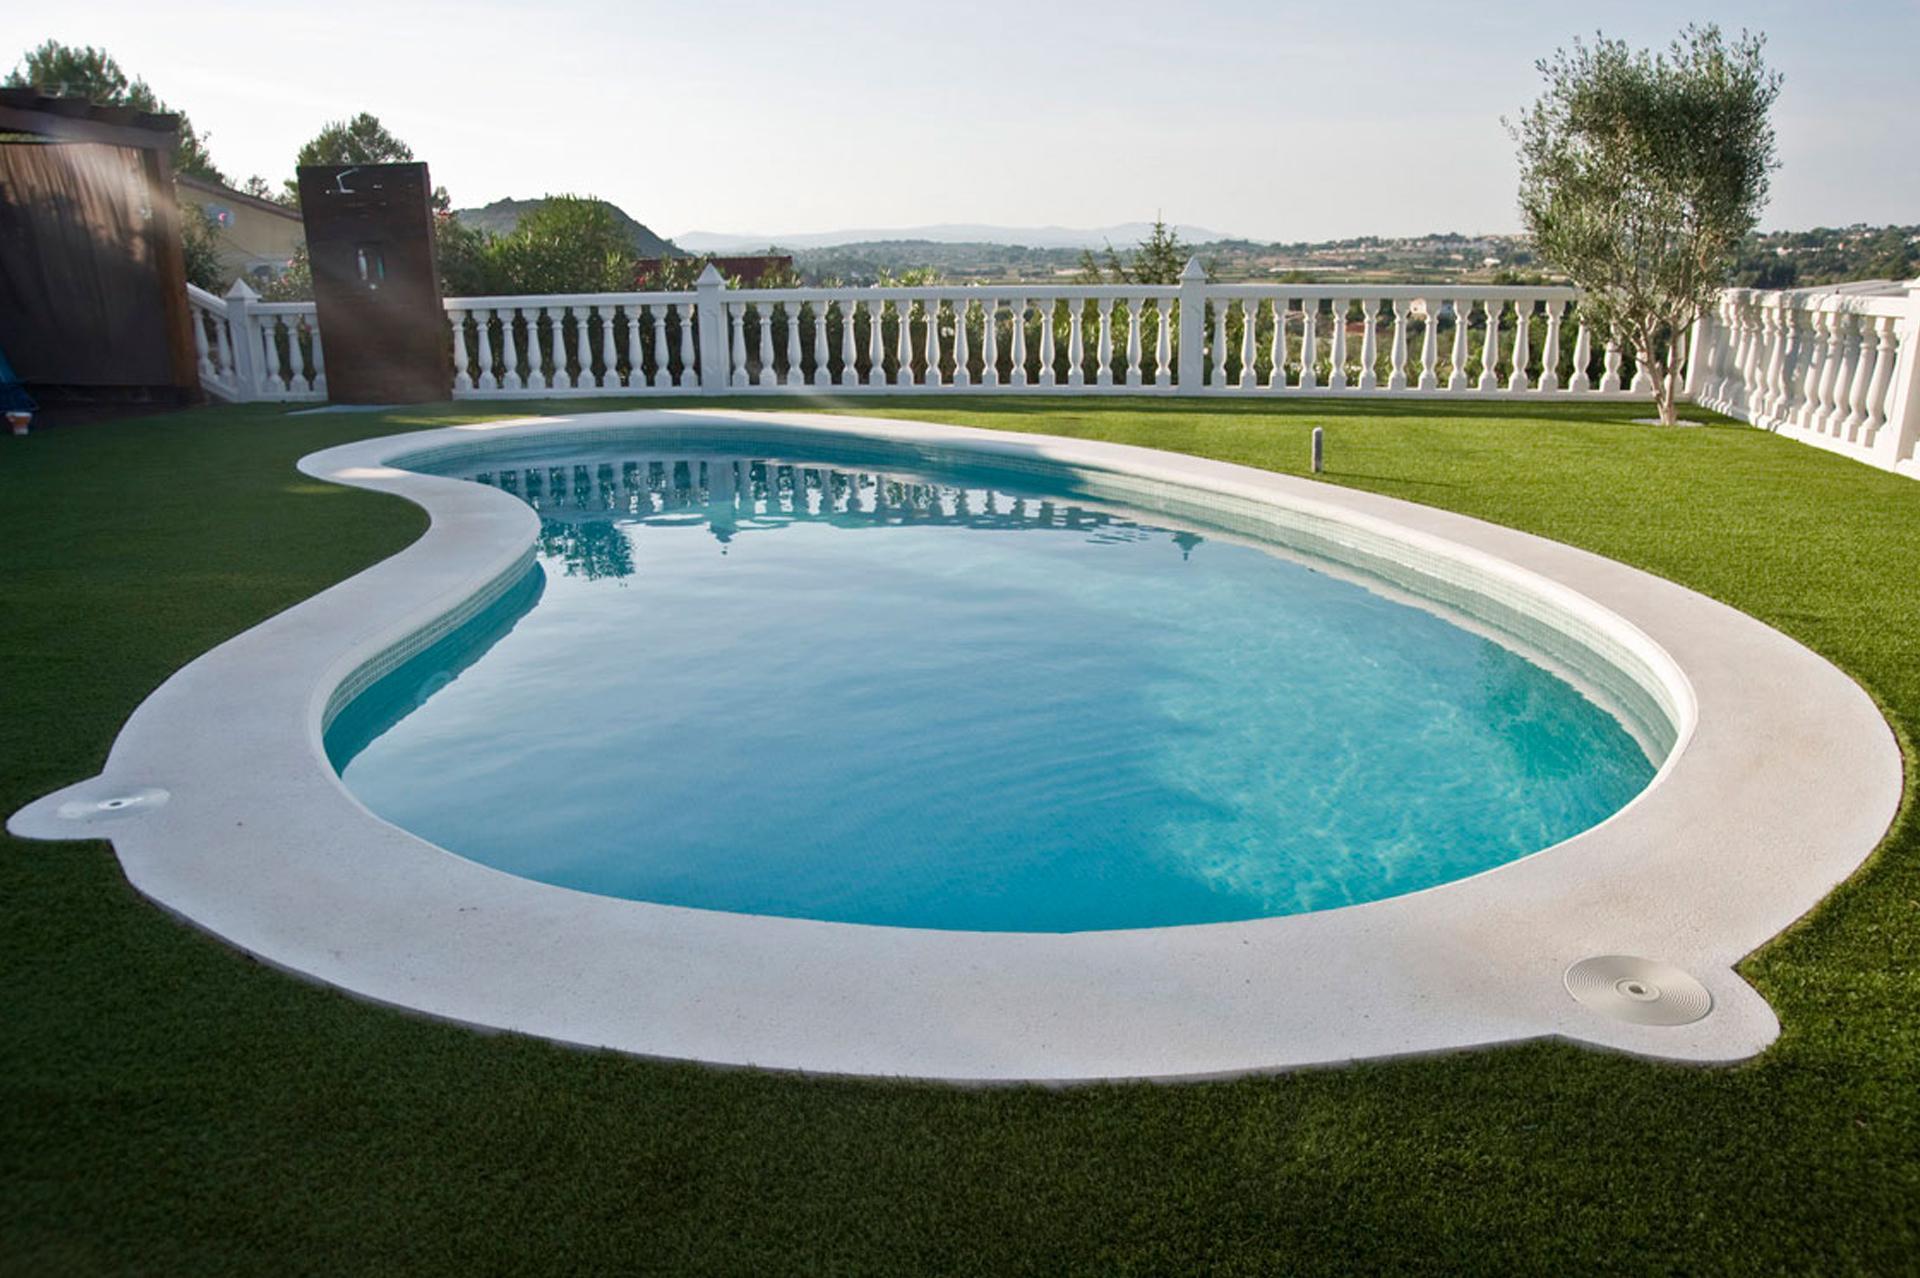 piscina_montserrat_poolplay_4